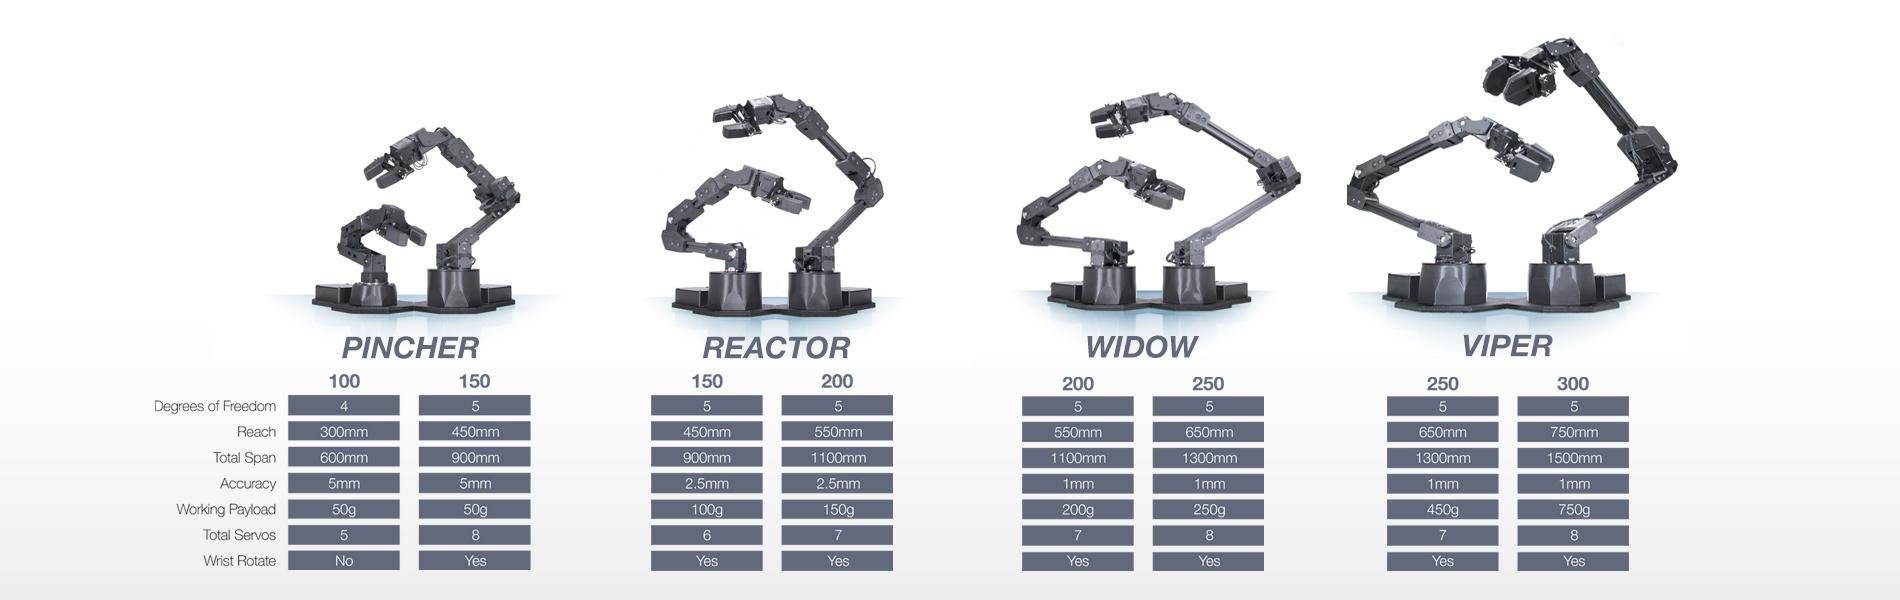 Trossen interbotix robotic arm comparison chart